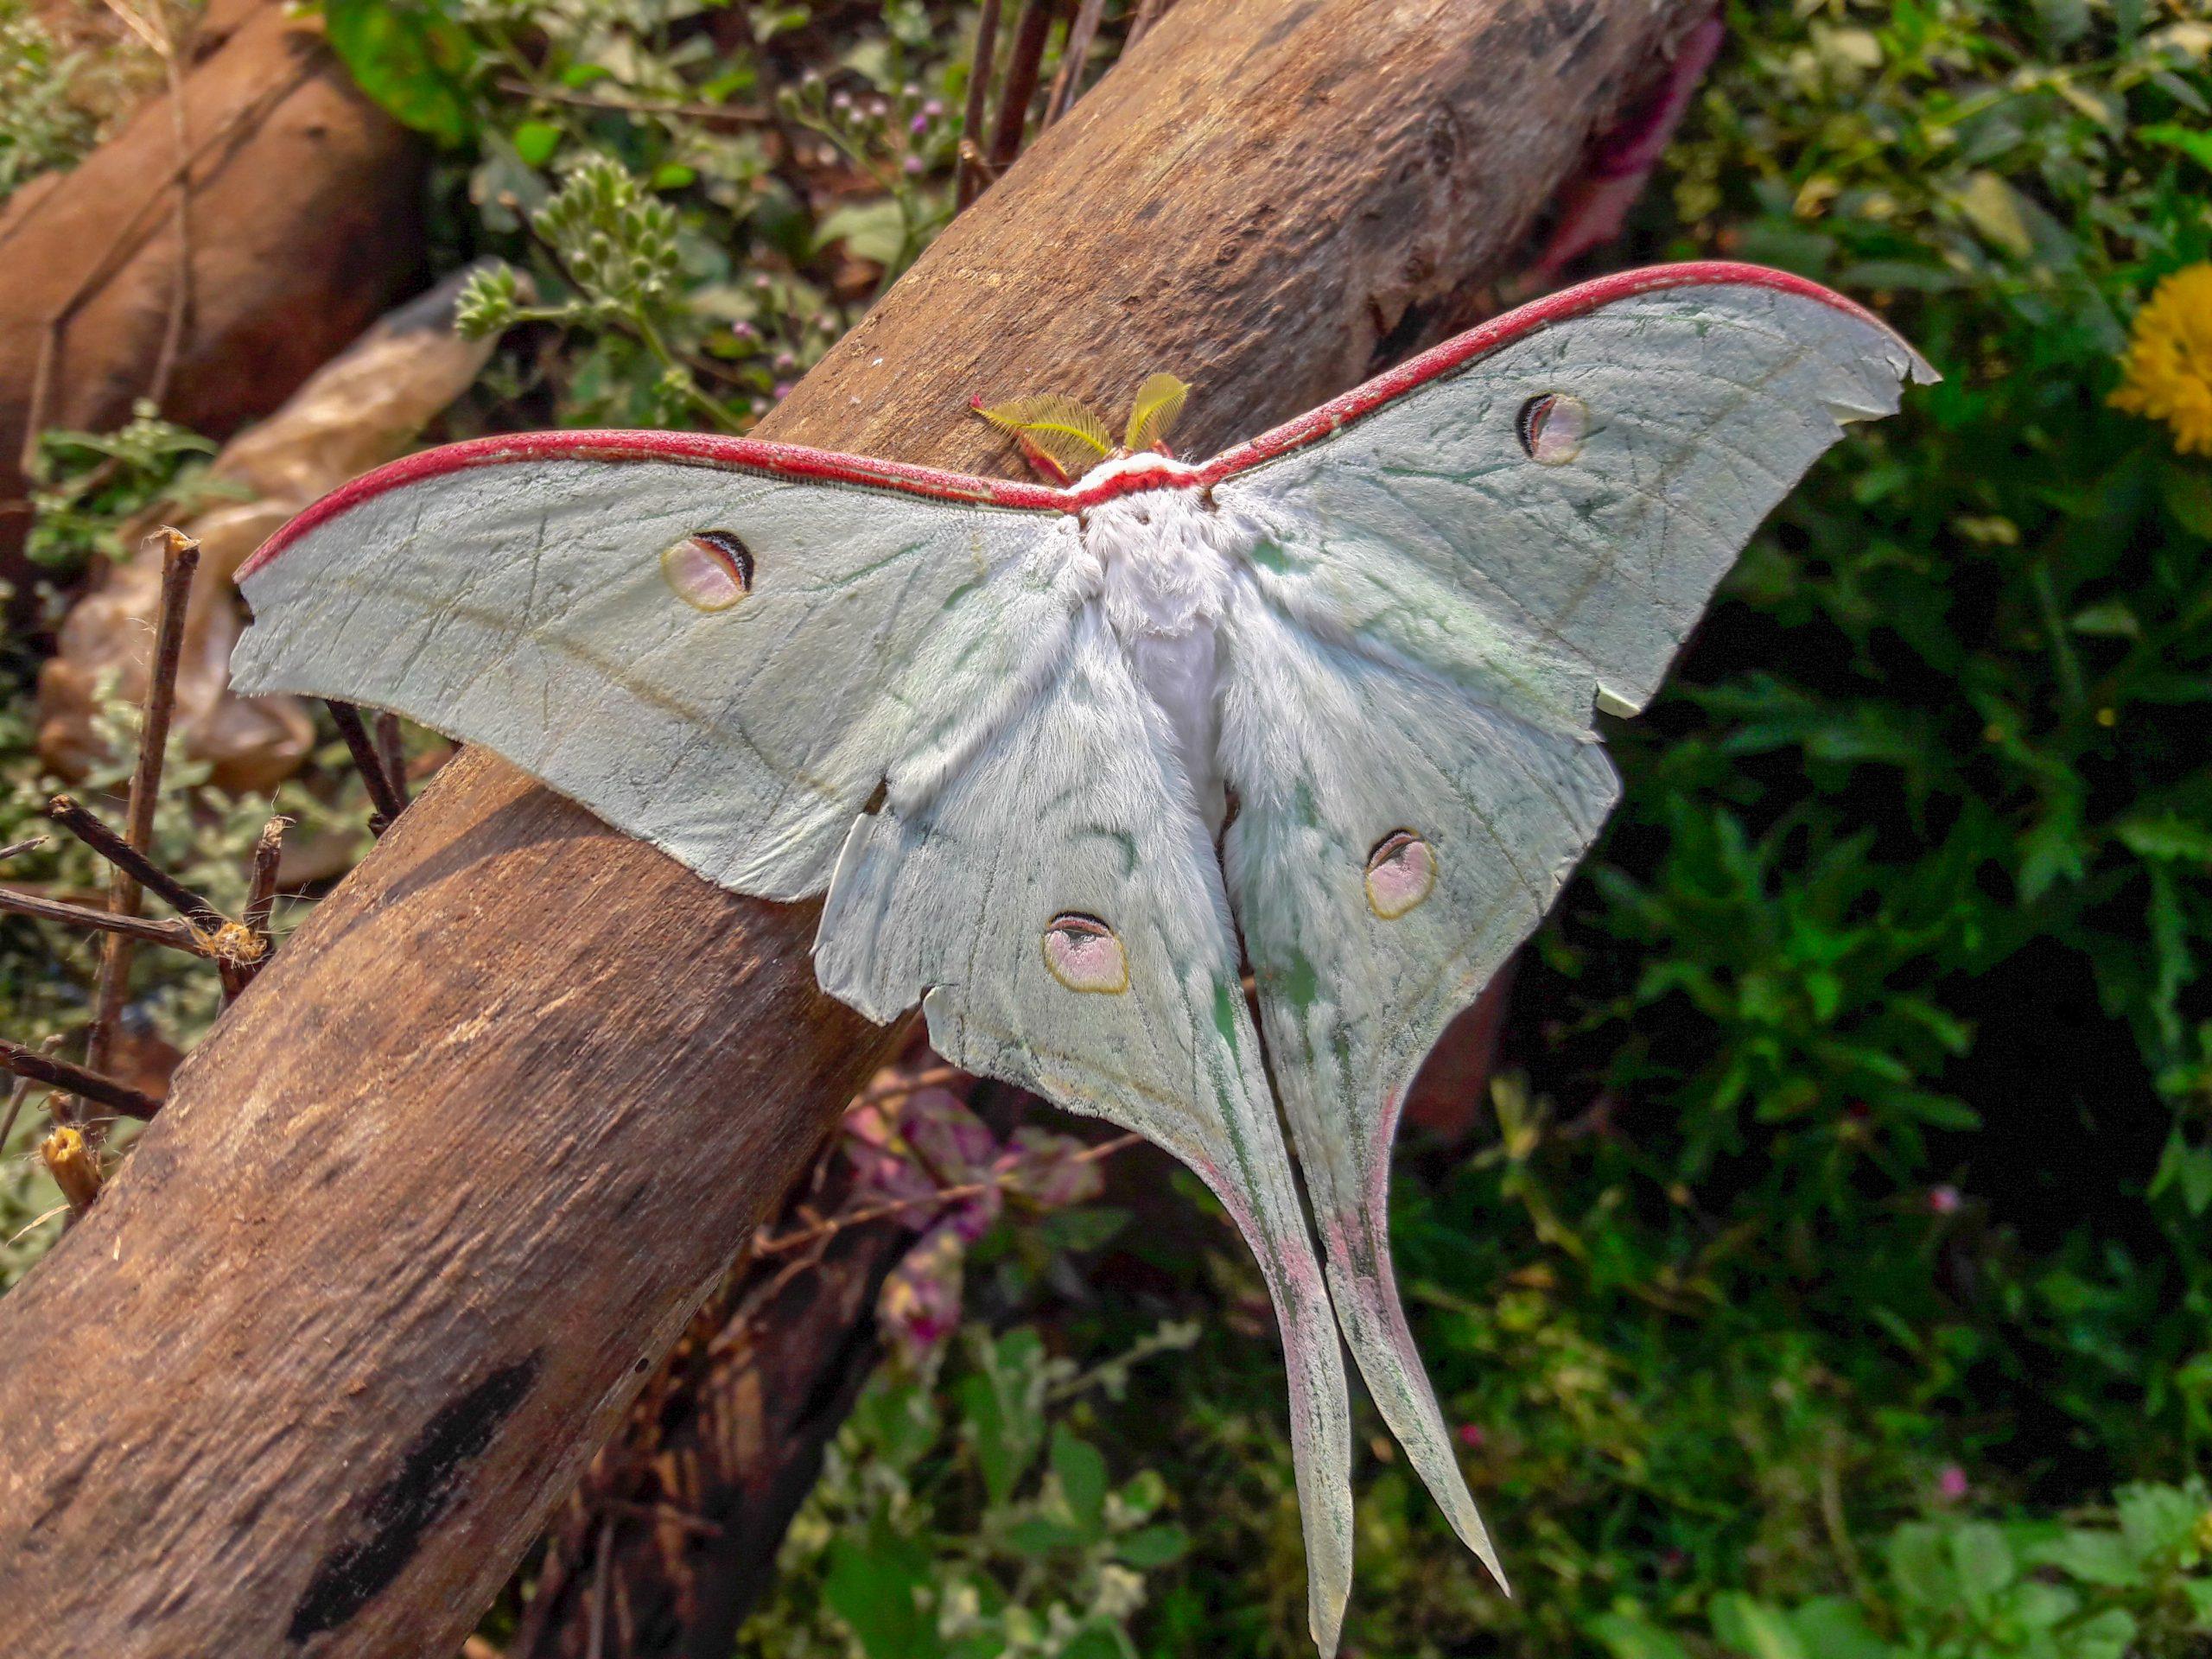 Moth on tree's branch